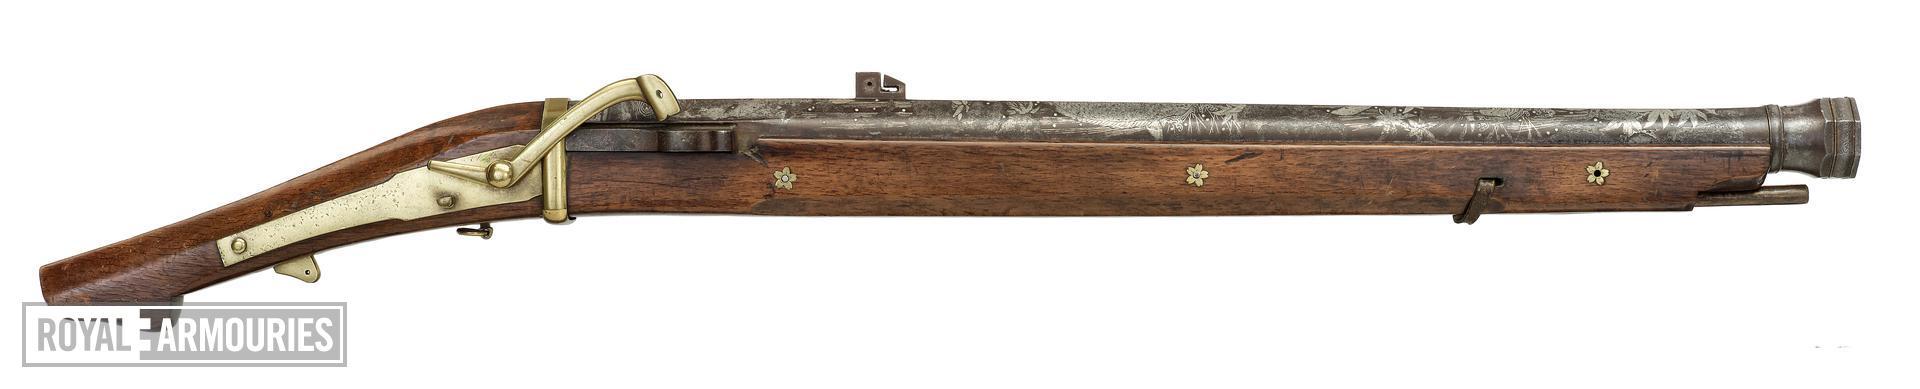 Matchlock musket (teppo)